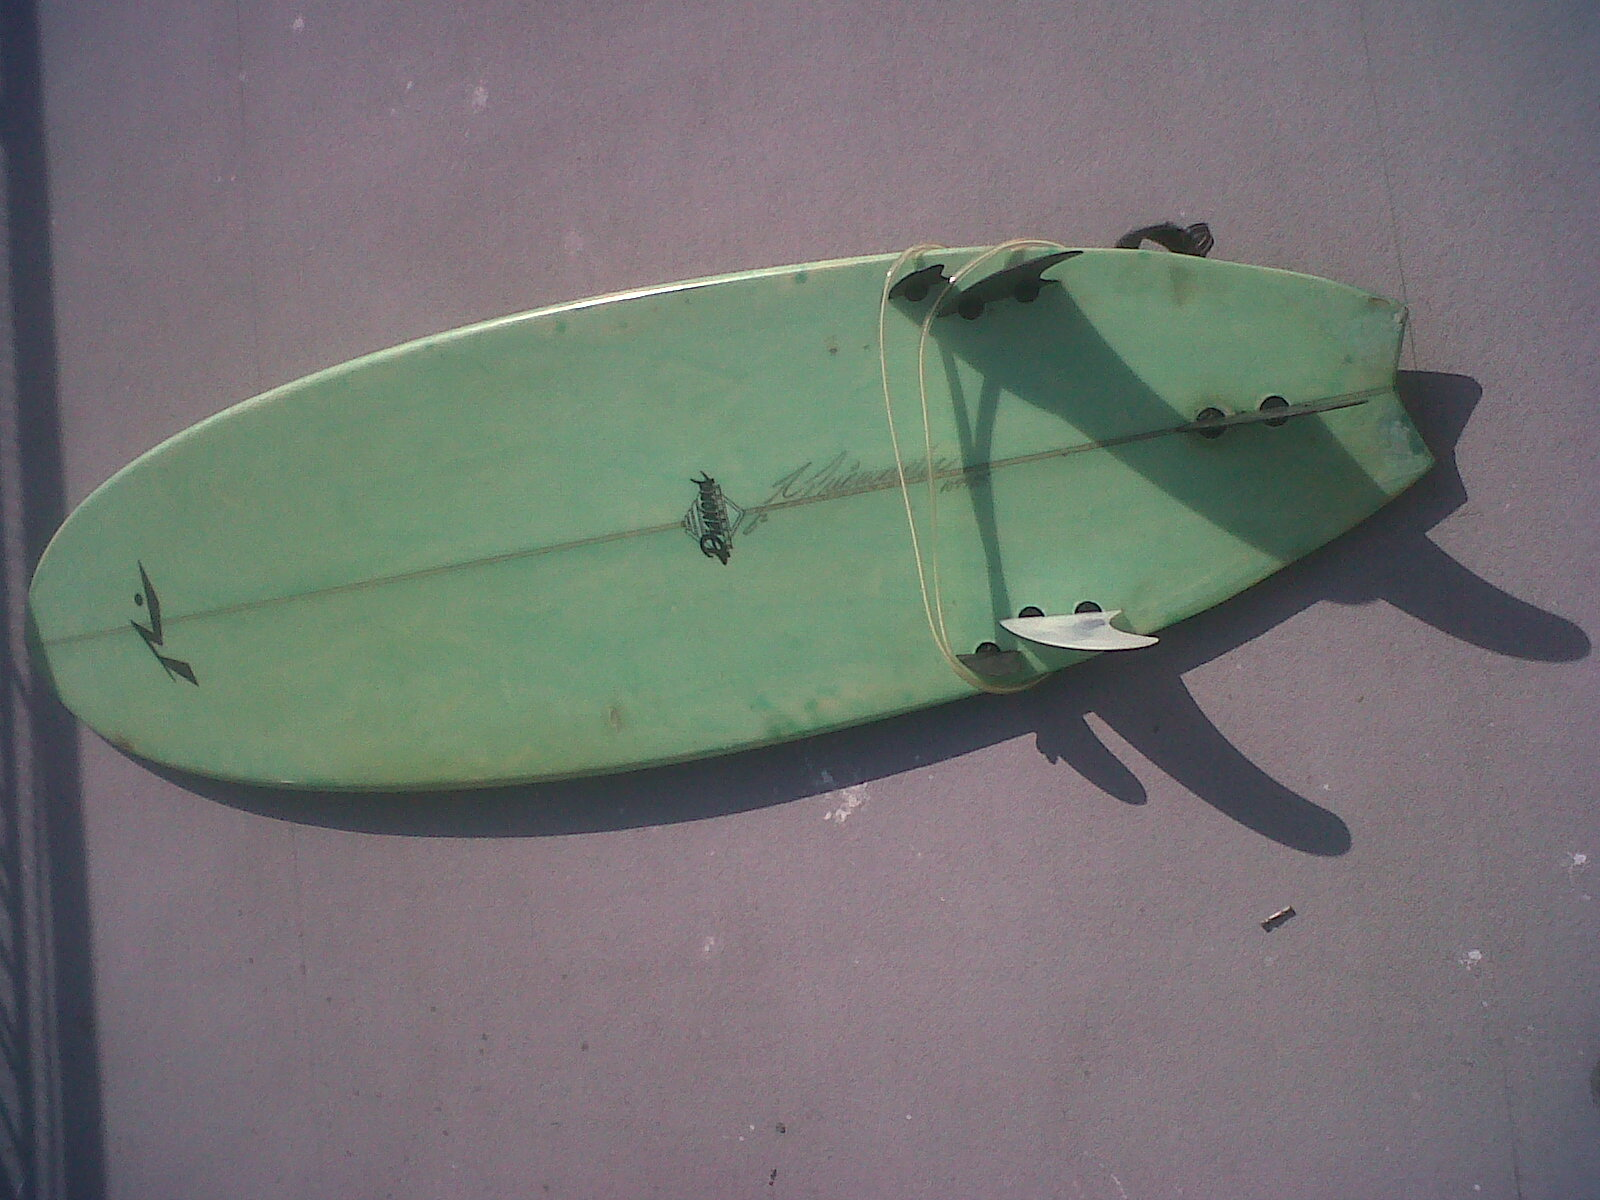 Tavola surf progressive surfmercato - Tavola surf usata subito it ...